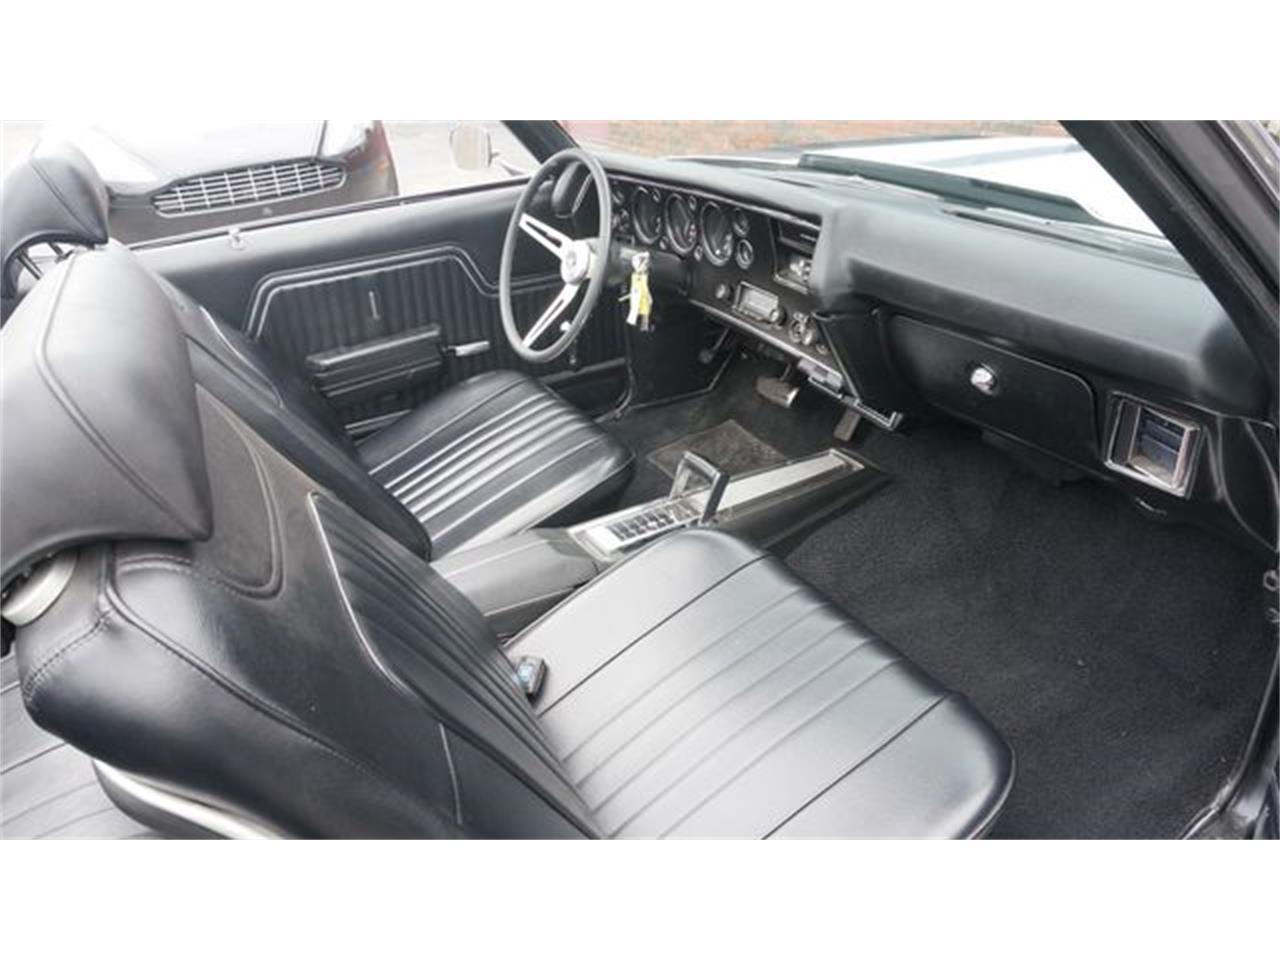 1972 Chevrolet Chevelle (CC-1229098) for sale in Valley Park, Missouri